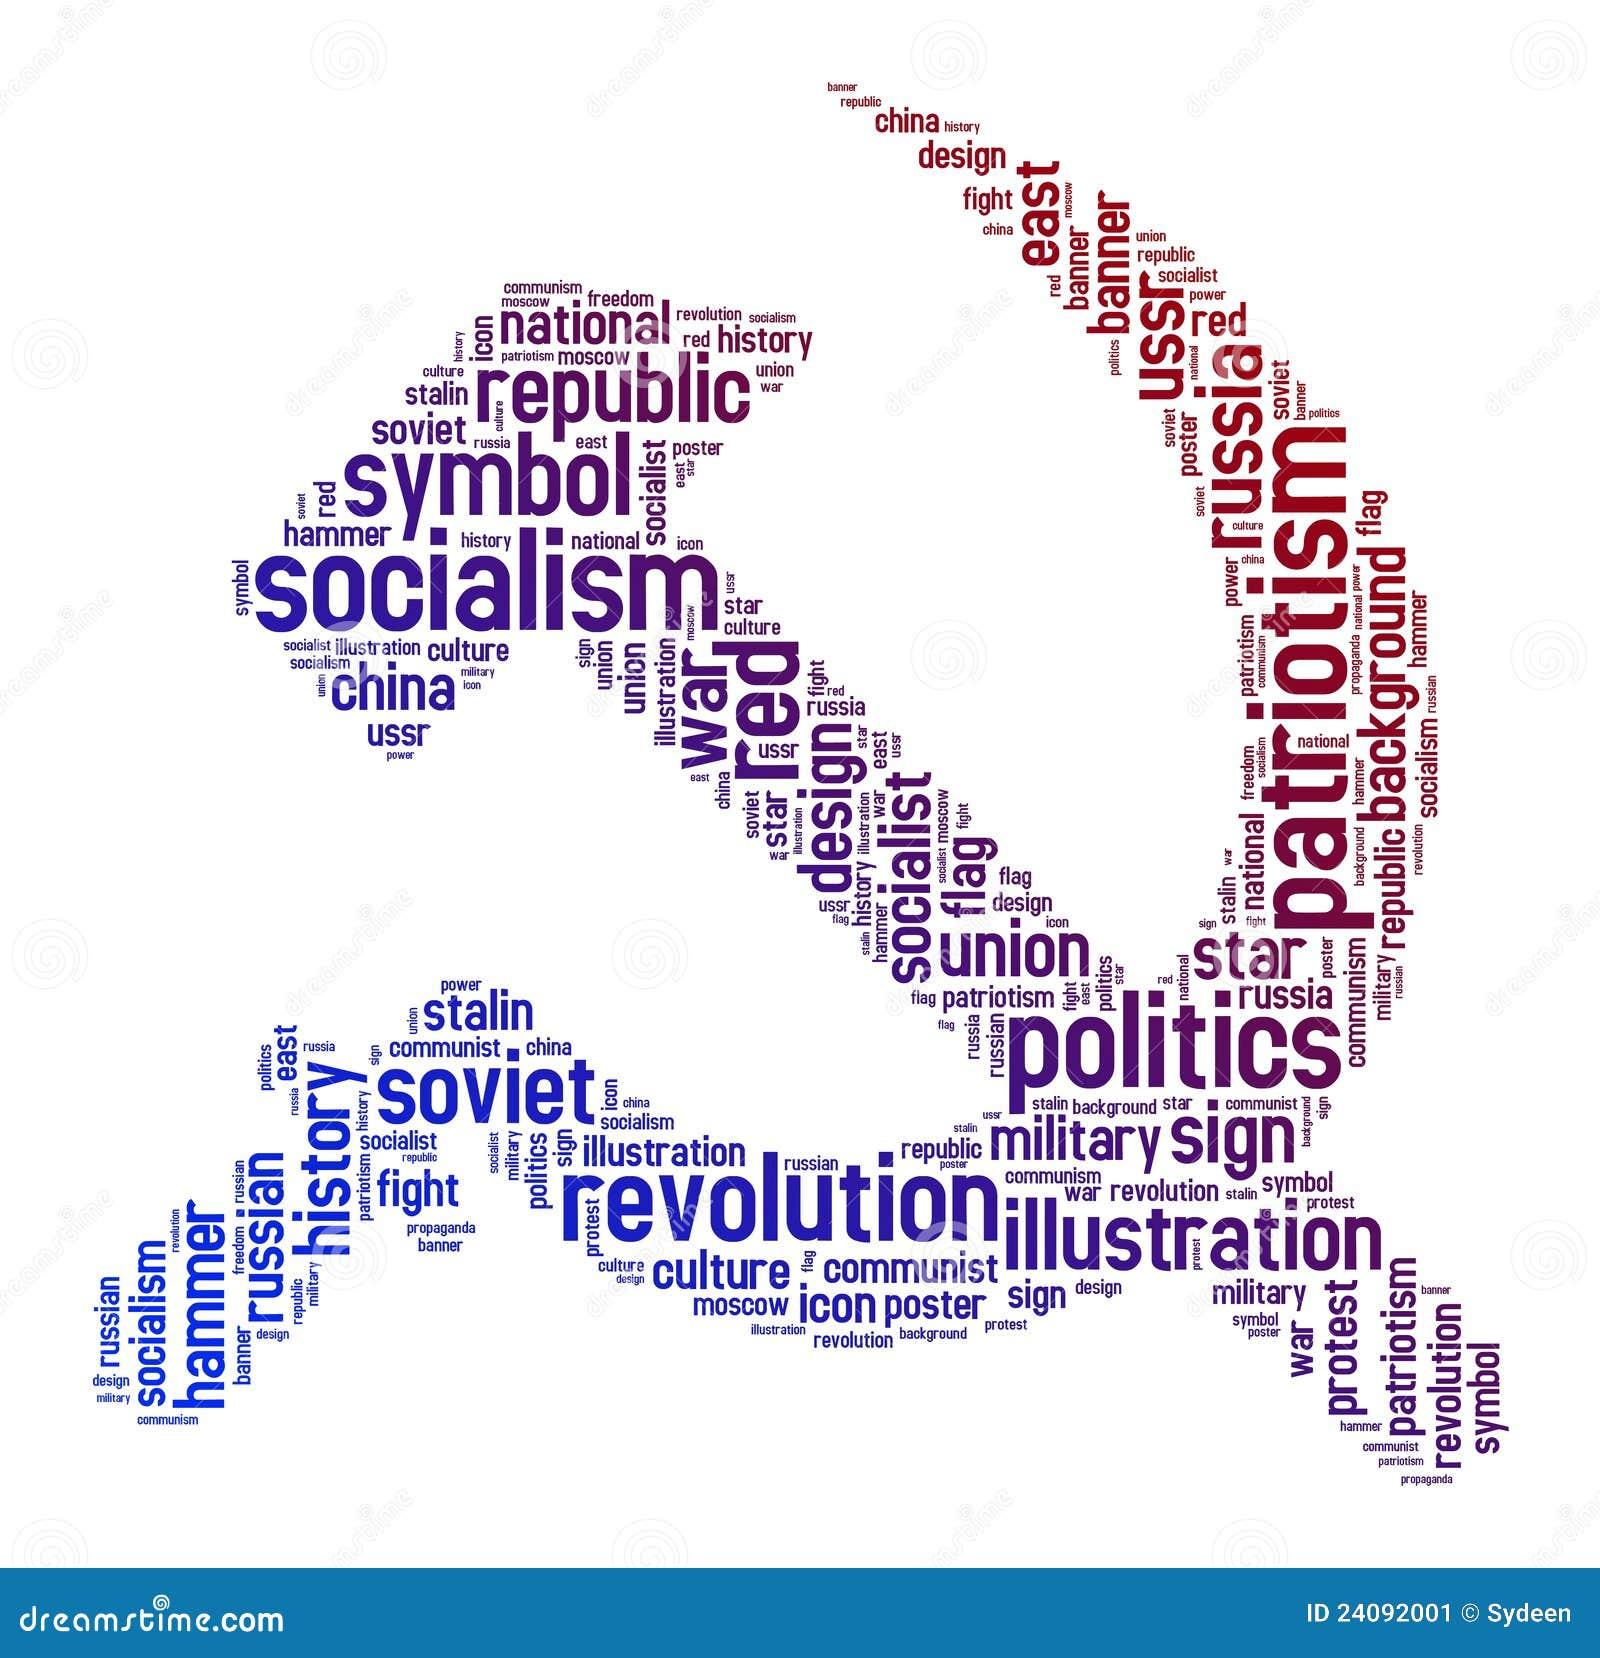 Communism symbols text stock illustration illustration of communism symbols text biocorpaavc Gallery